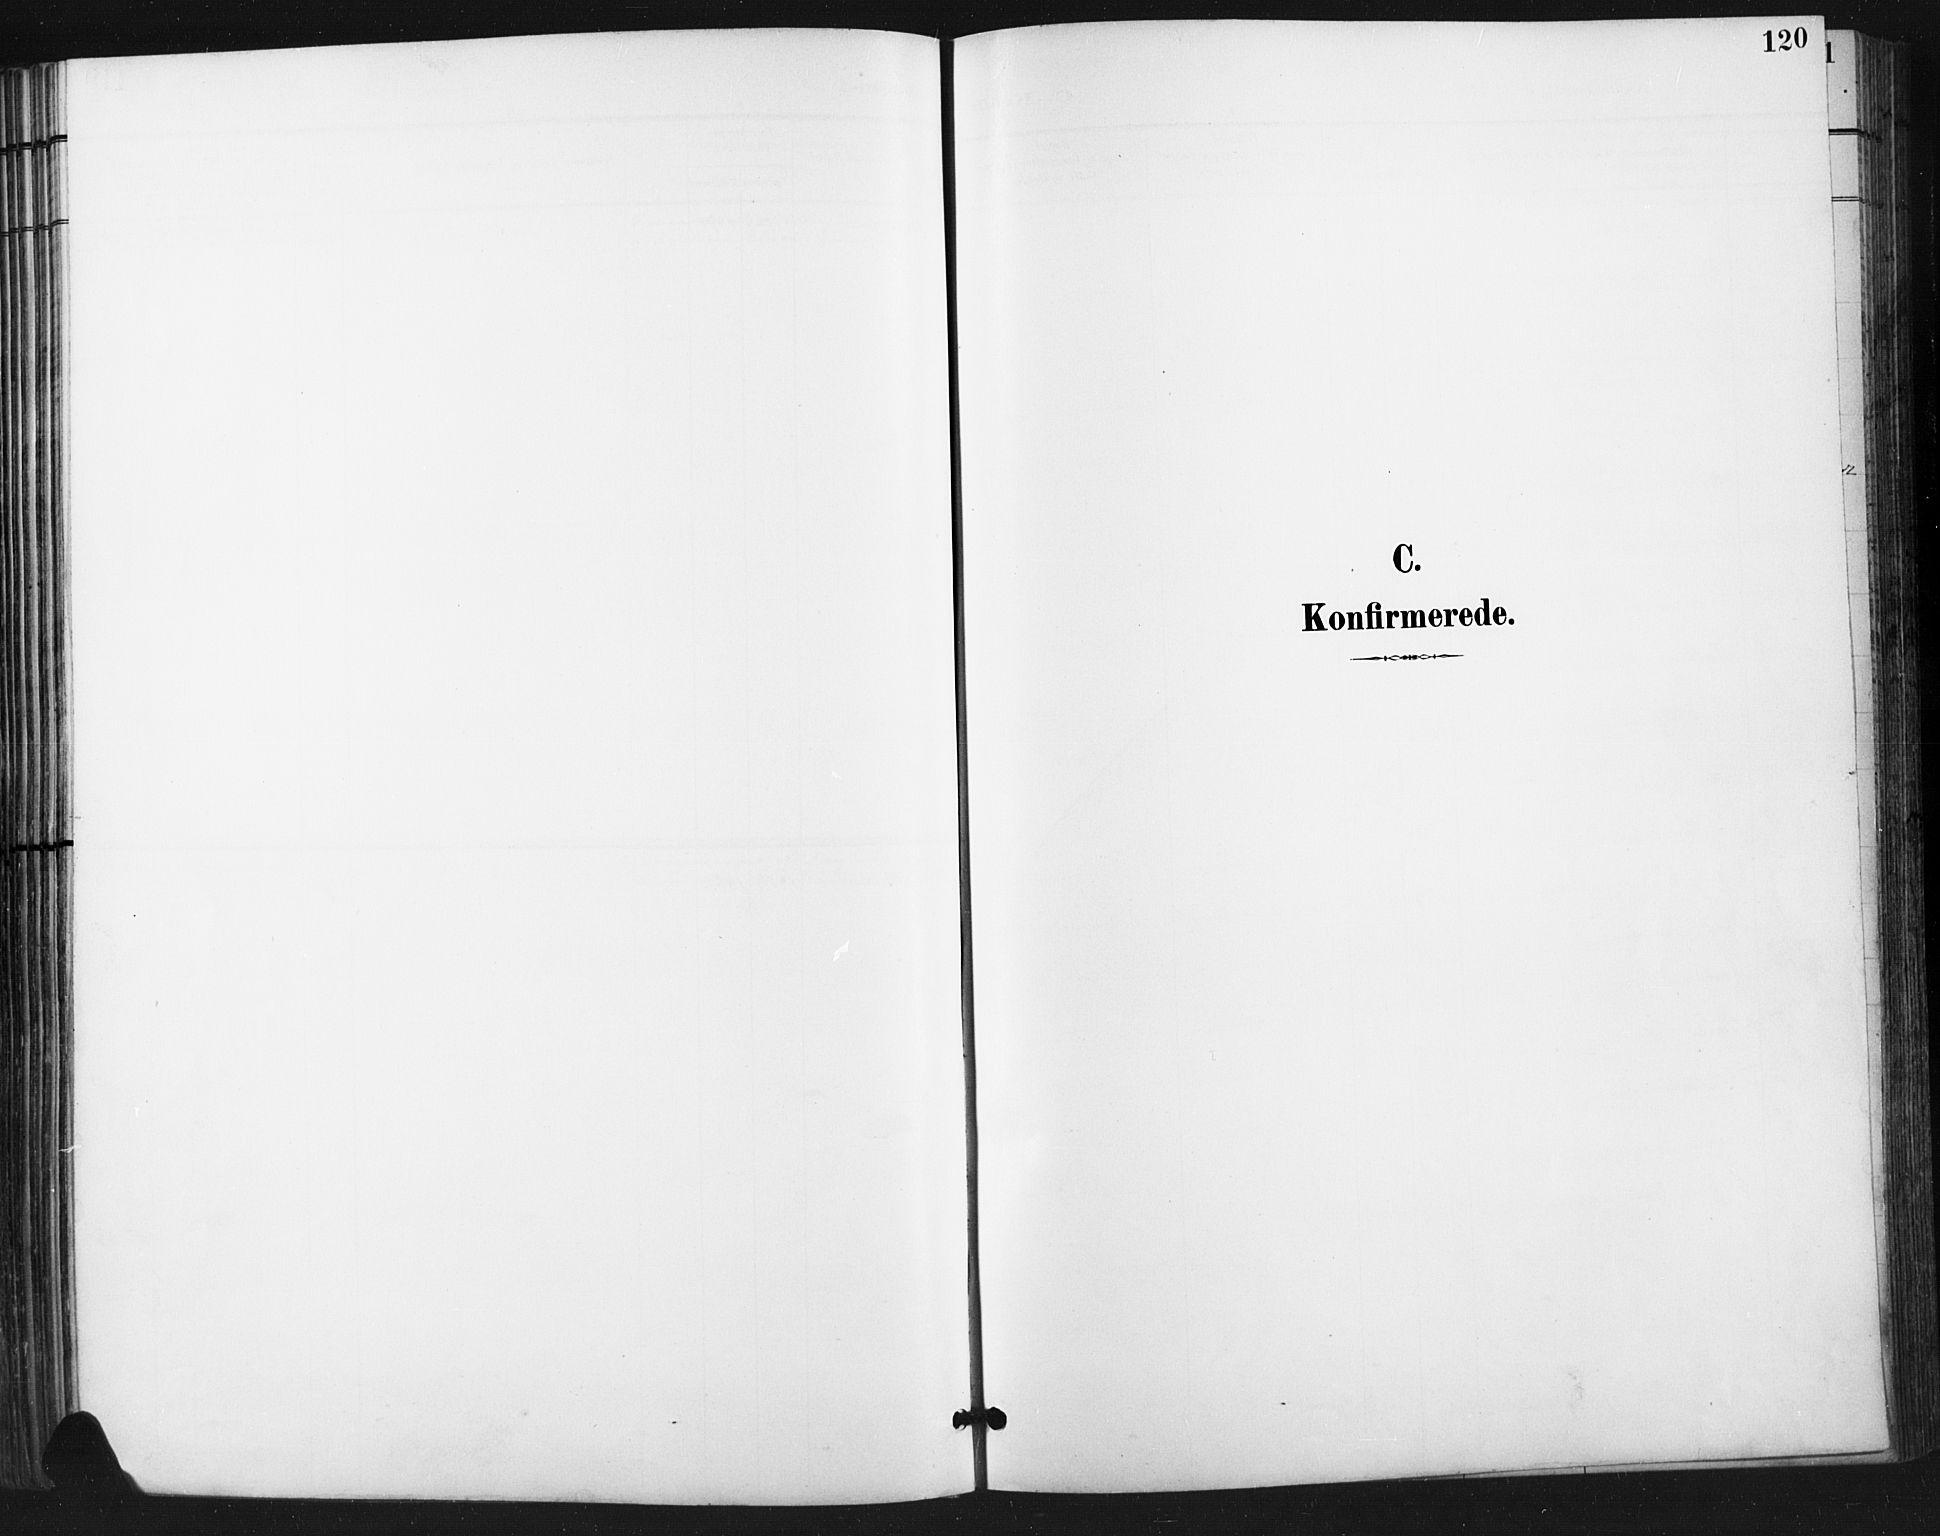 SAH, Vestre Gausdal prestekontor, Klokkerbok nr. 3, 1896-1925, s. 120